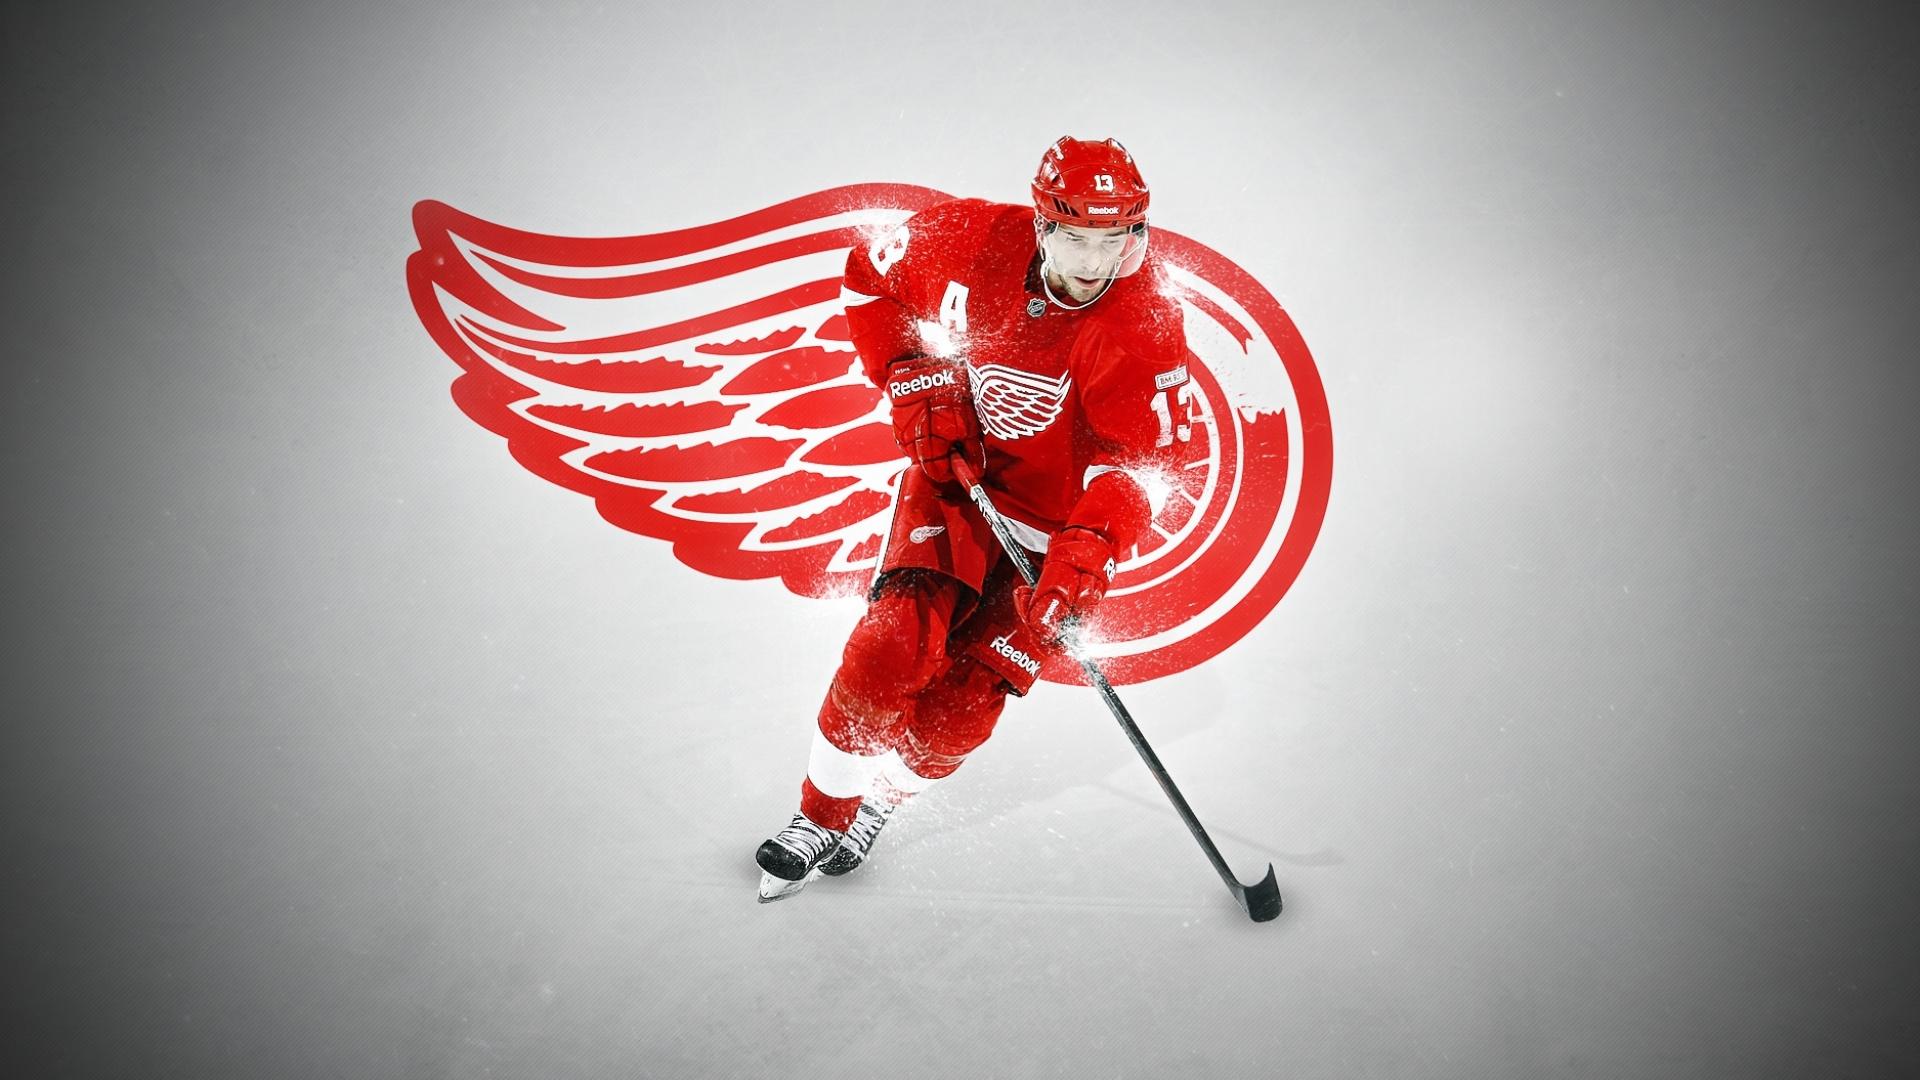 Download hockey nhl dat detroit red wings pavel datsyuk wallpaper 1920x1080